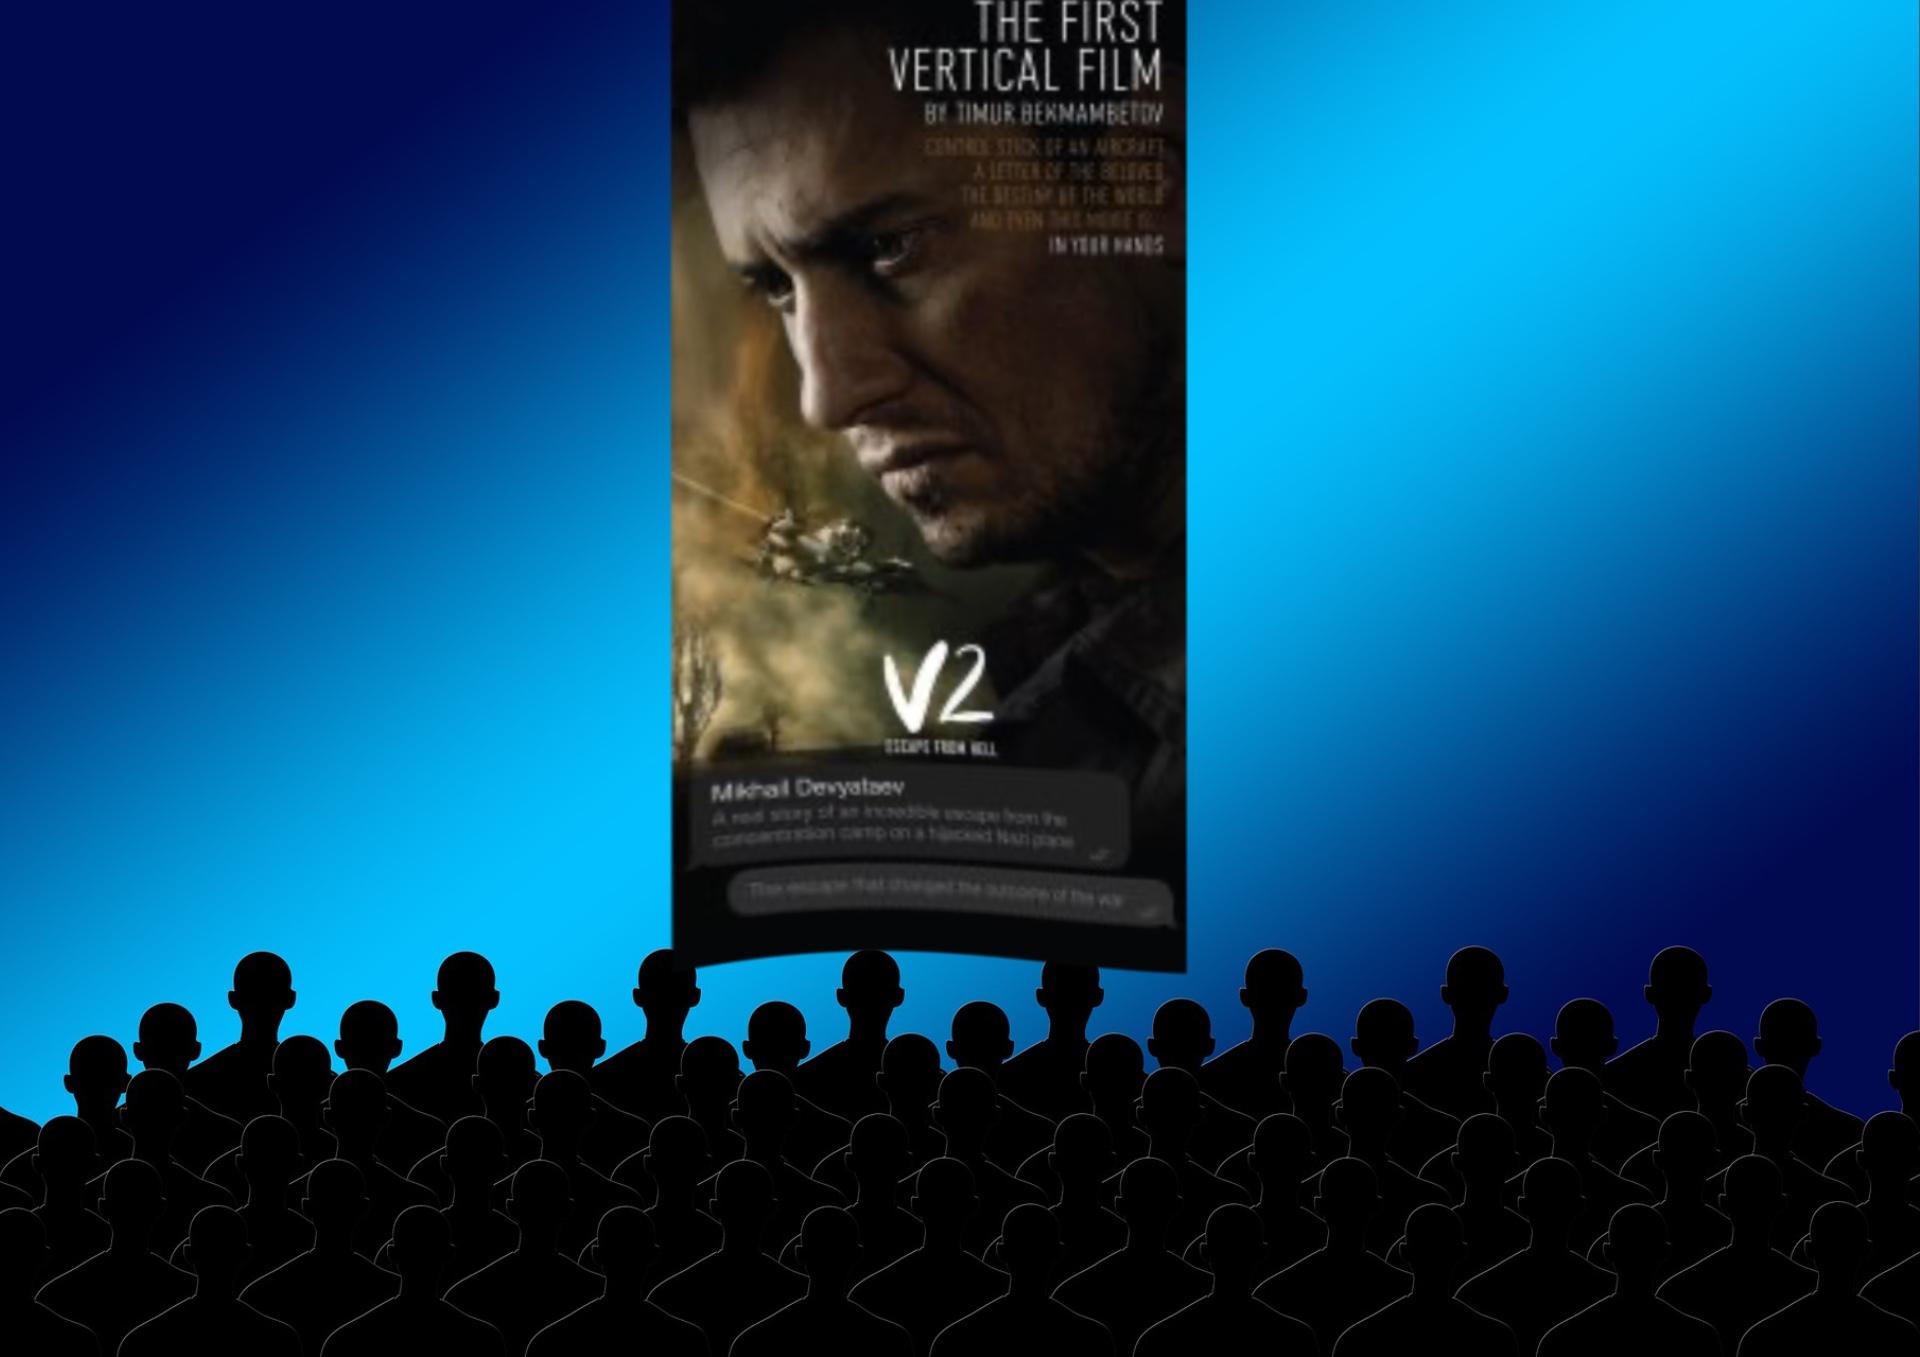 Film vertikal